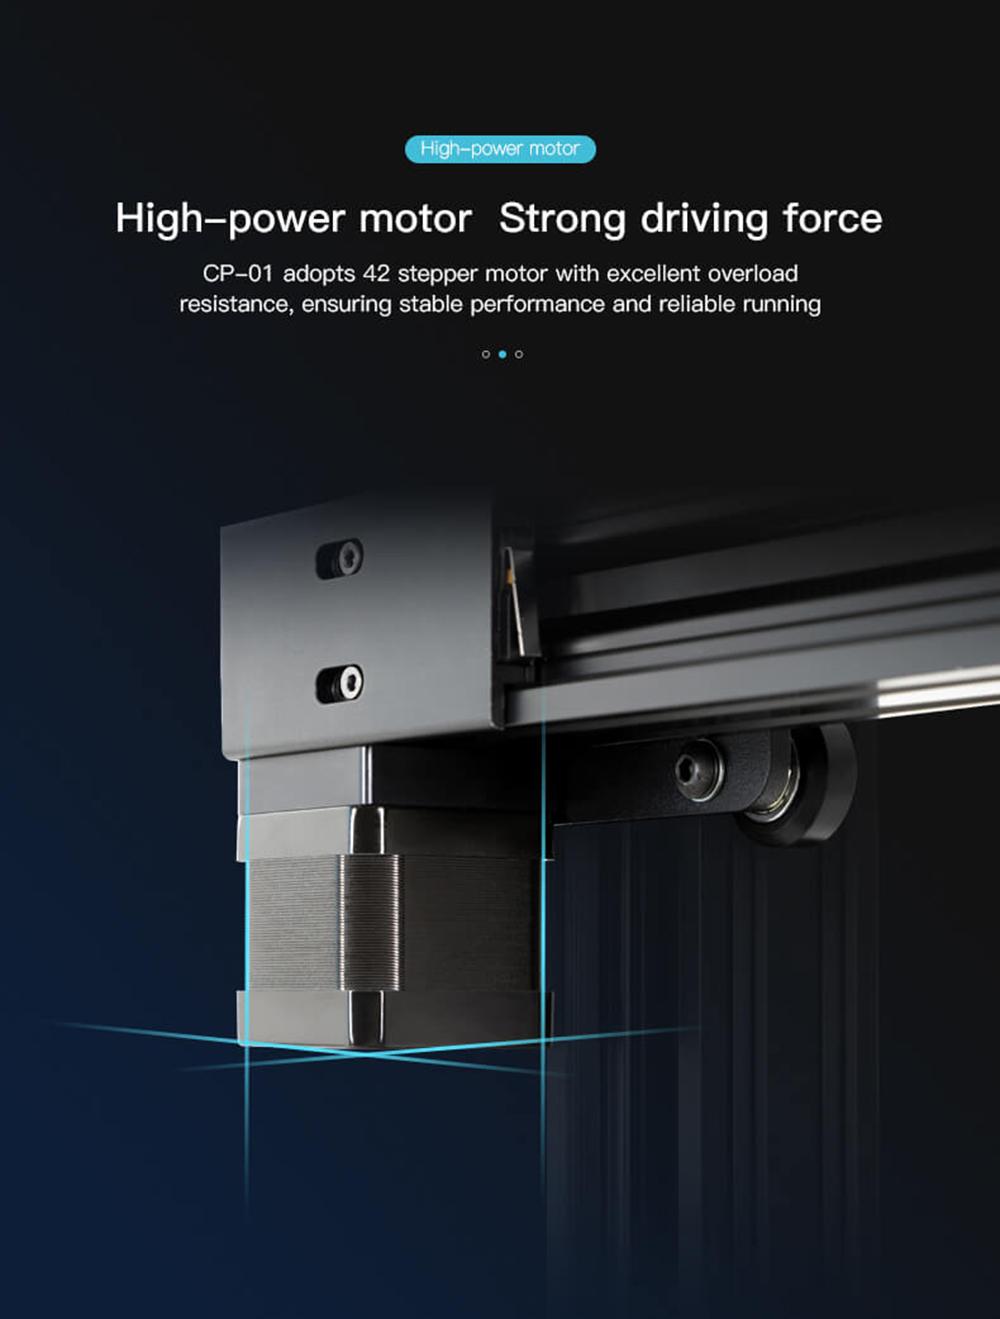 Creality3D CP-01 Multitool 3D-Drucker Bausatz - 200x200x200mm - Hochleistungs-Schrittmotoren